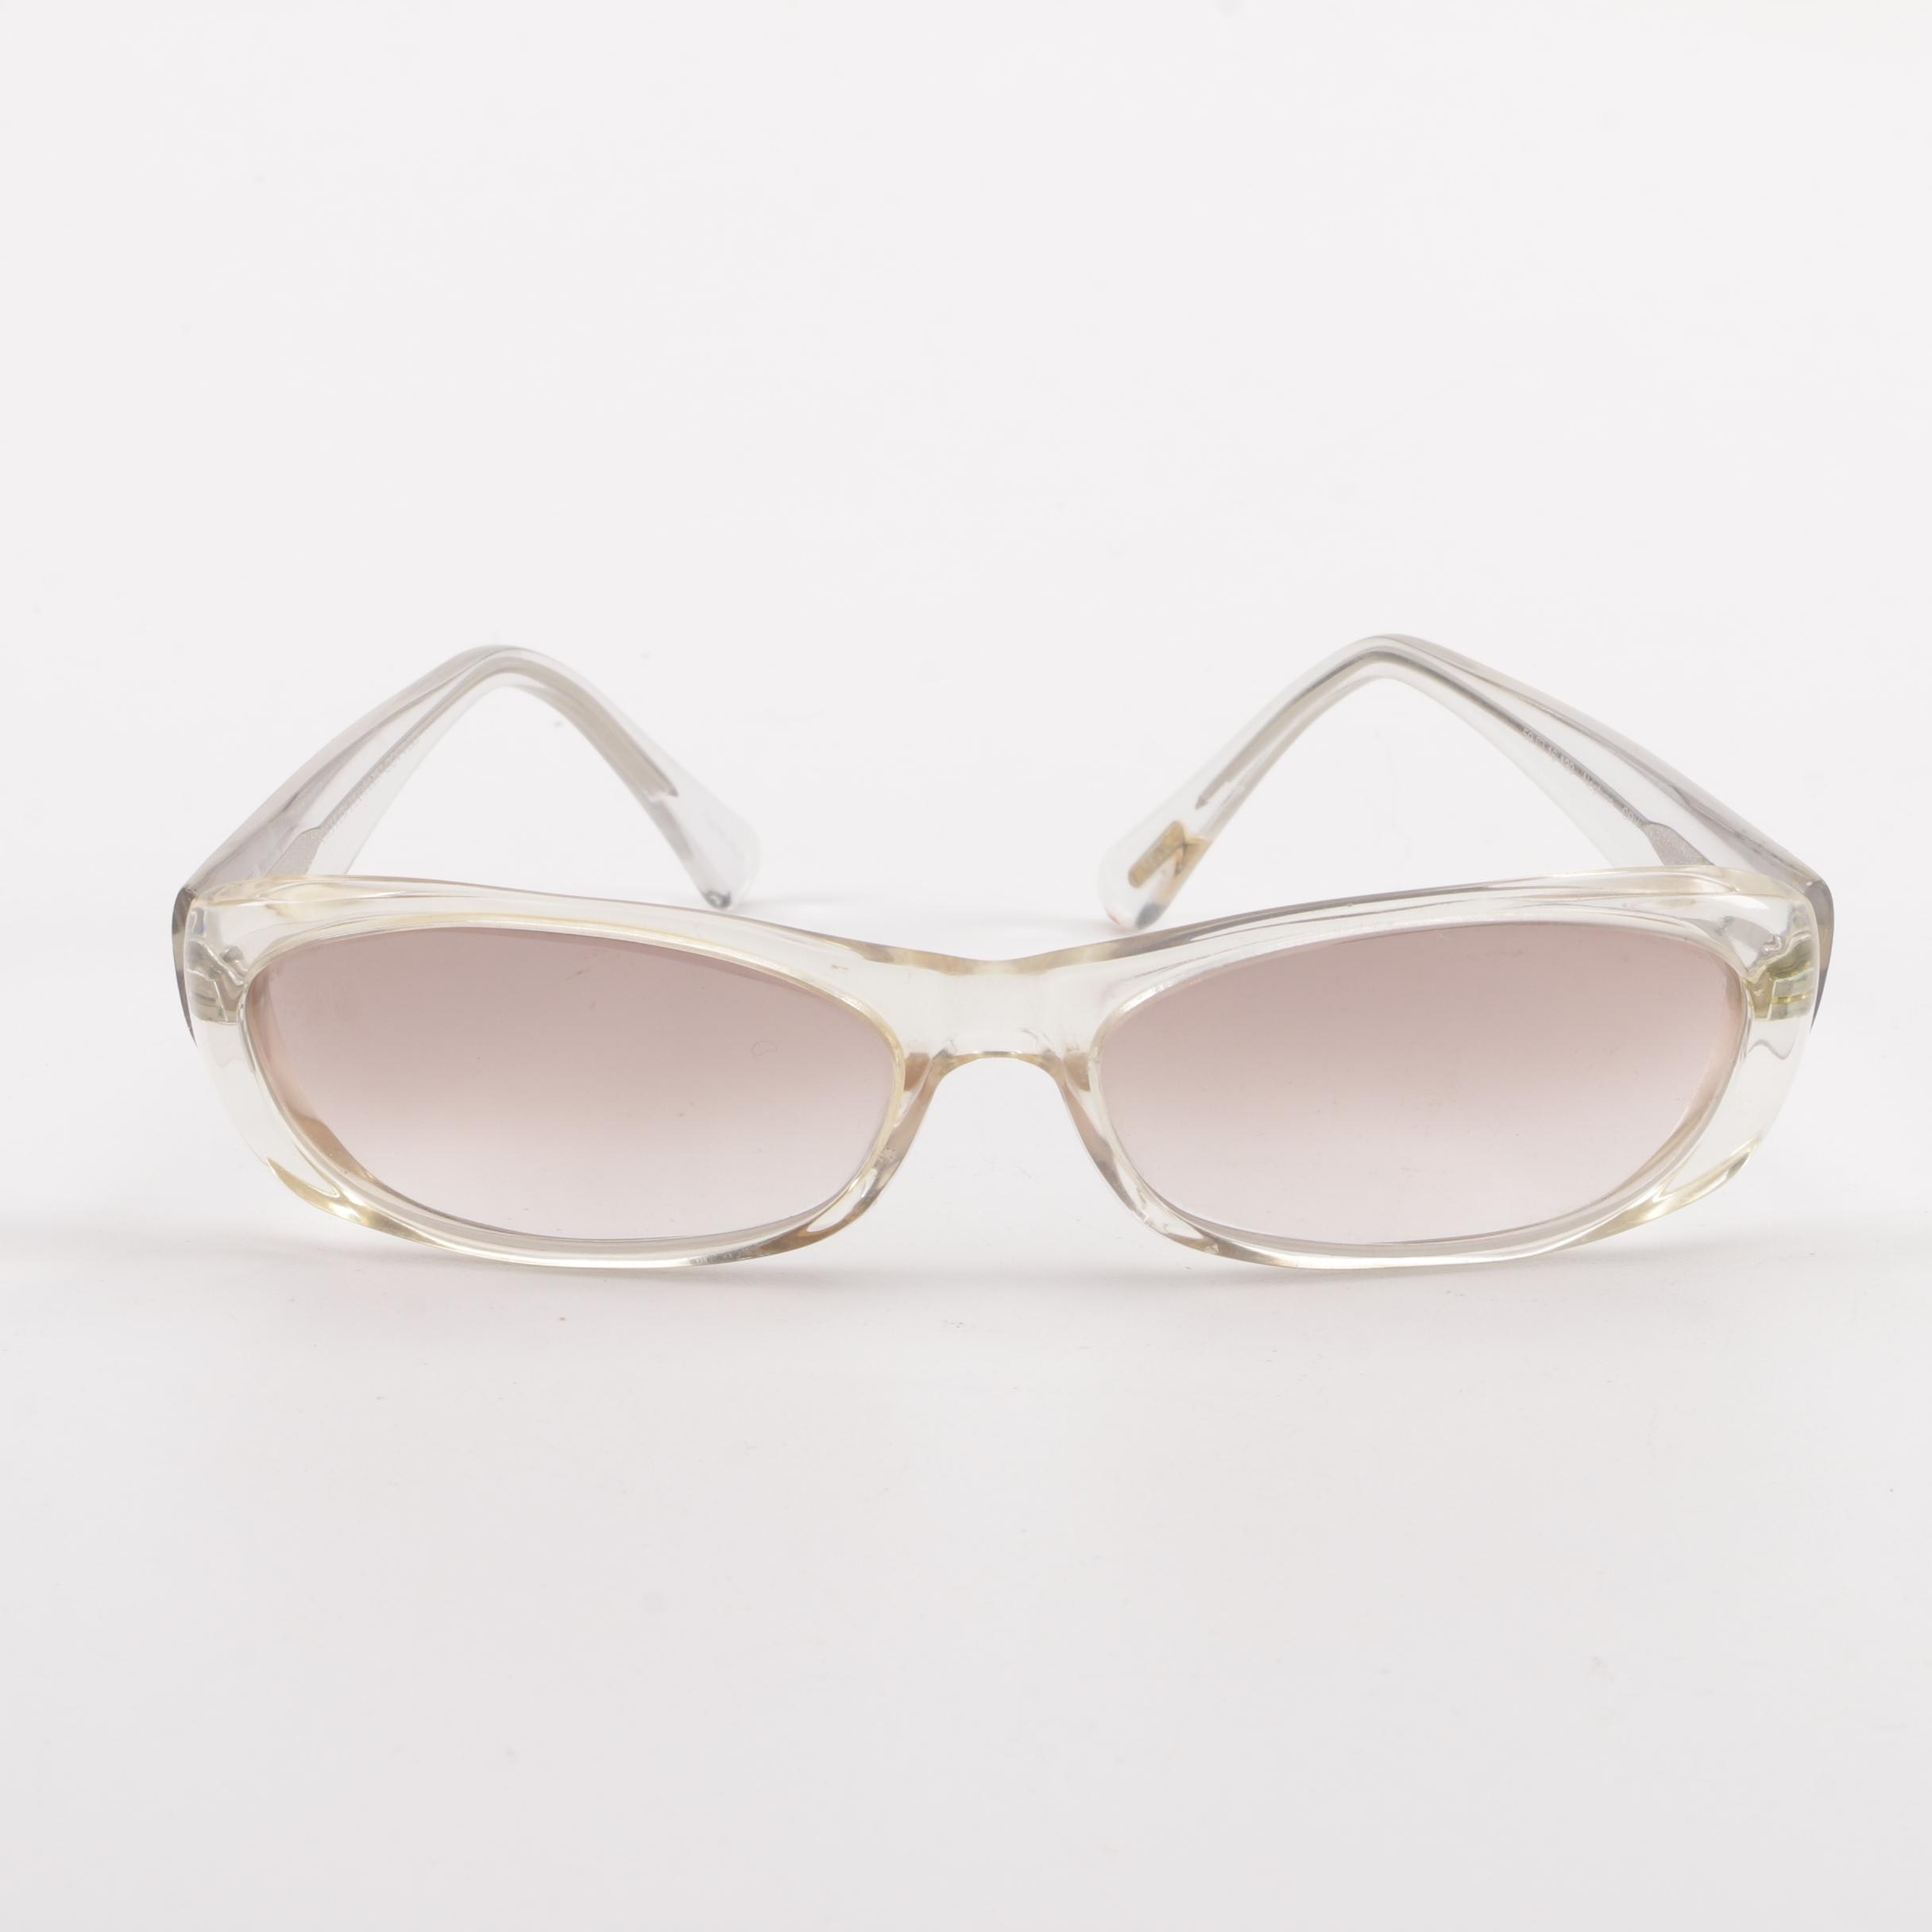 Oliver Peoples Neptune Prescription Sunglasses